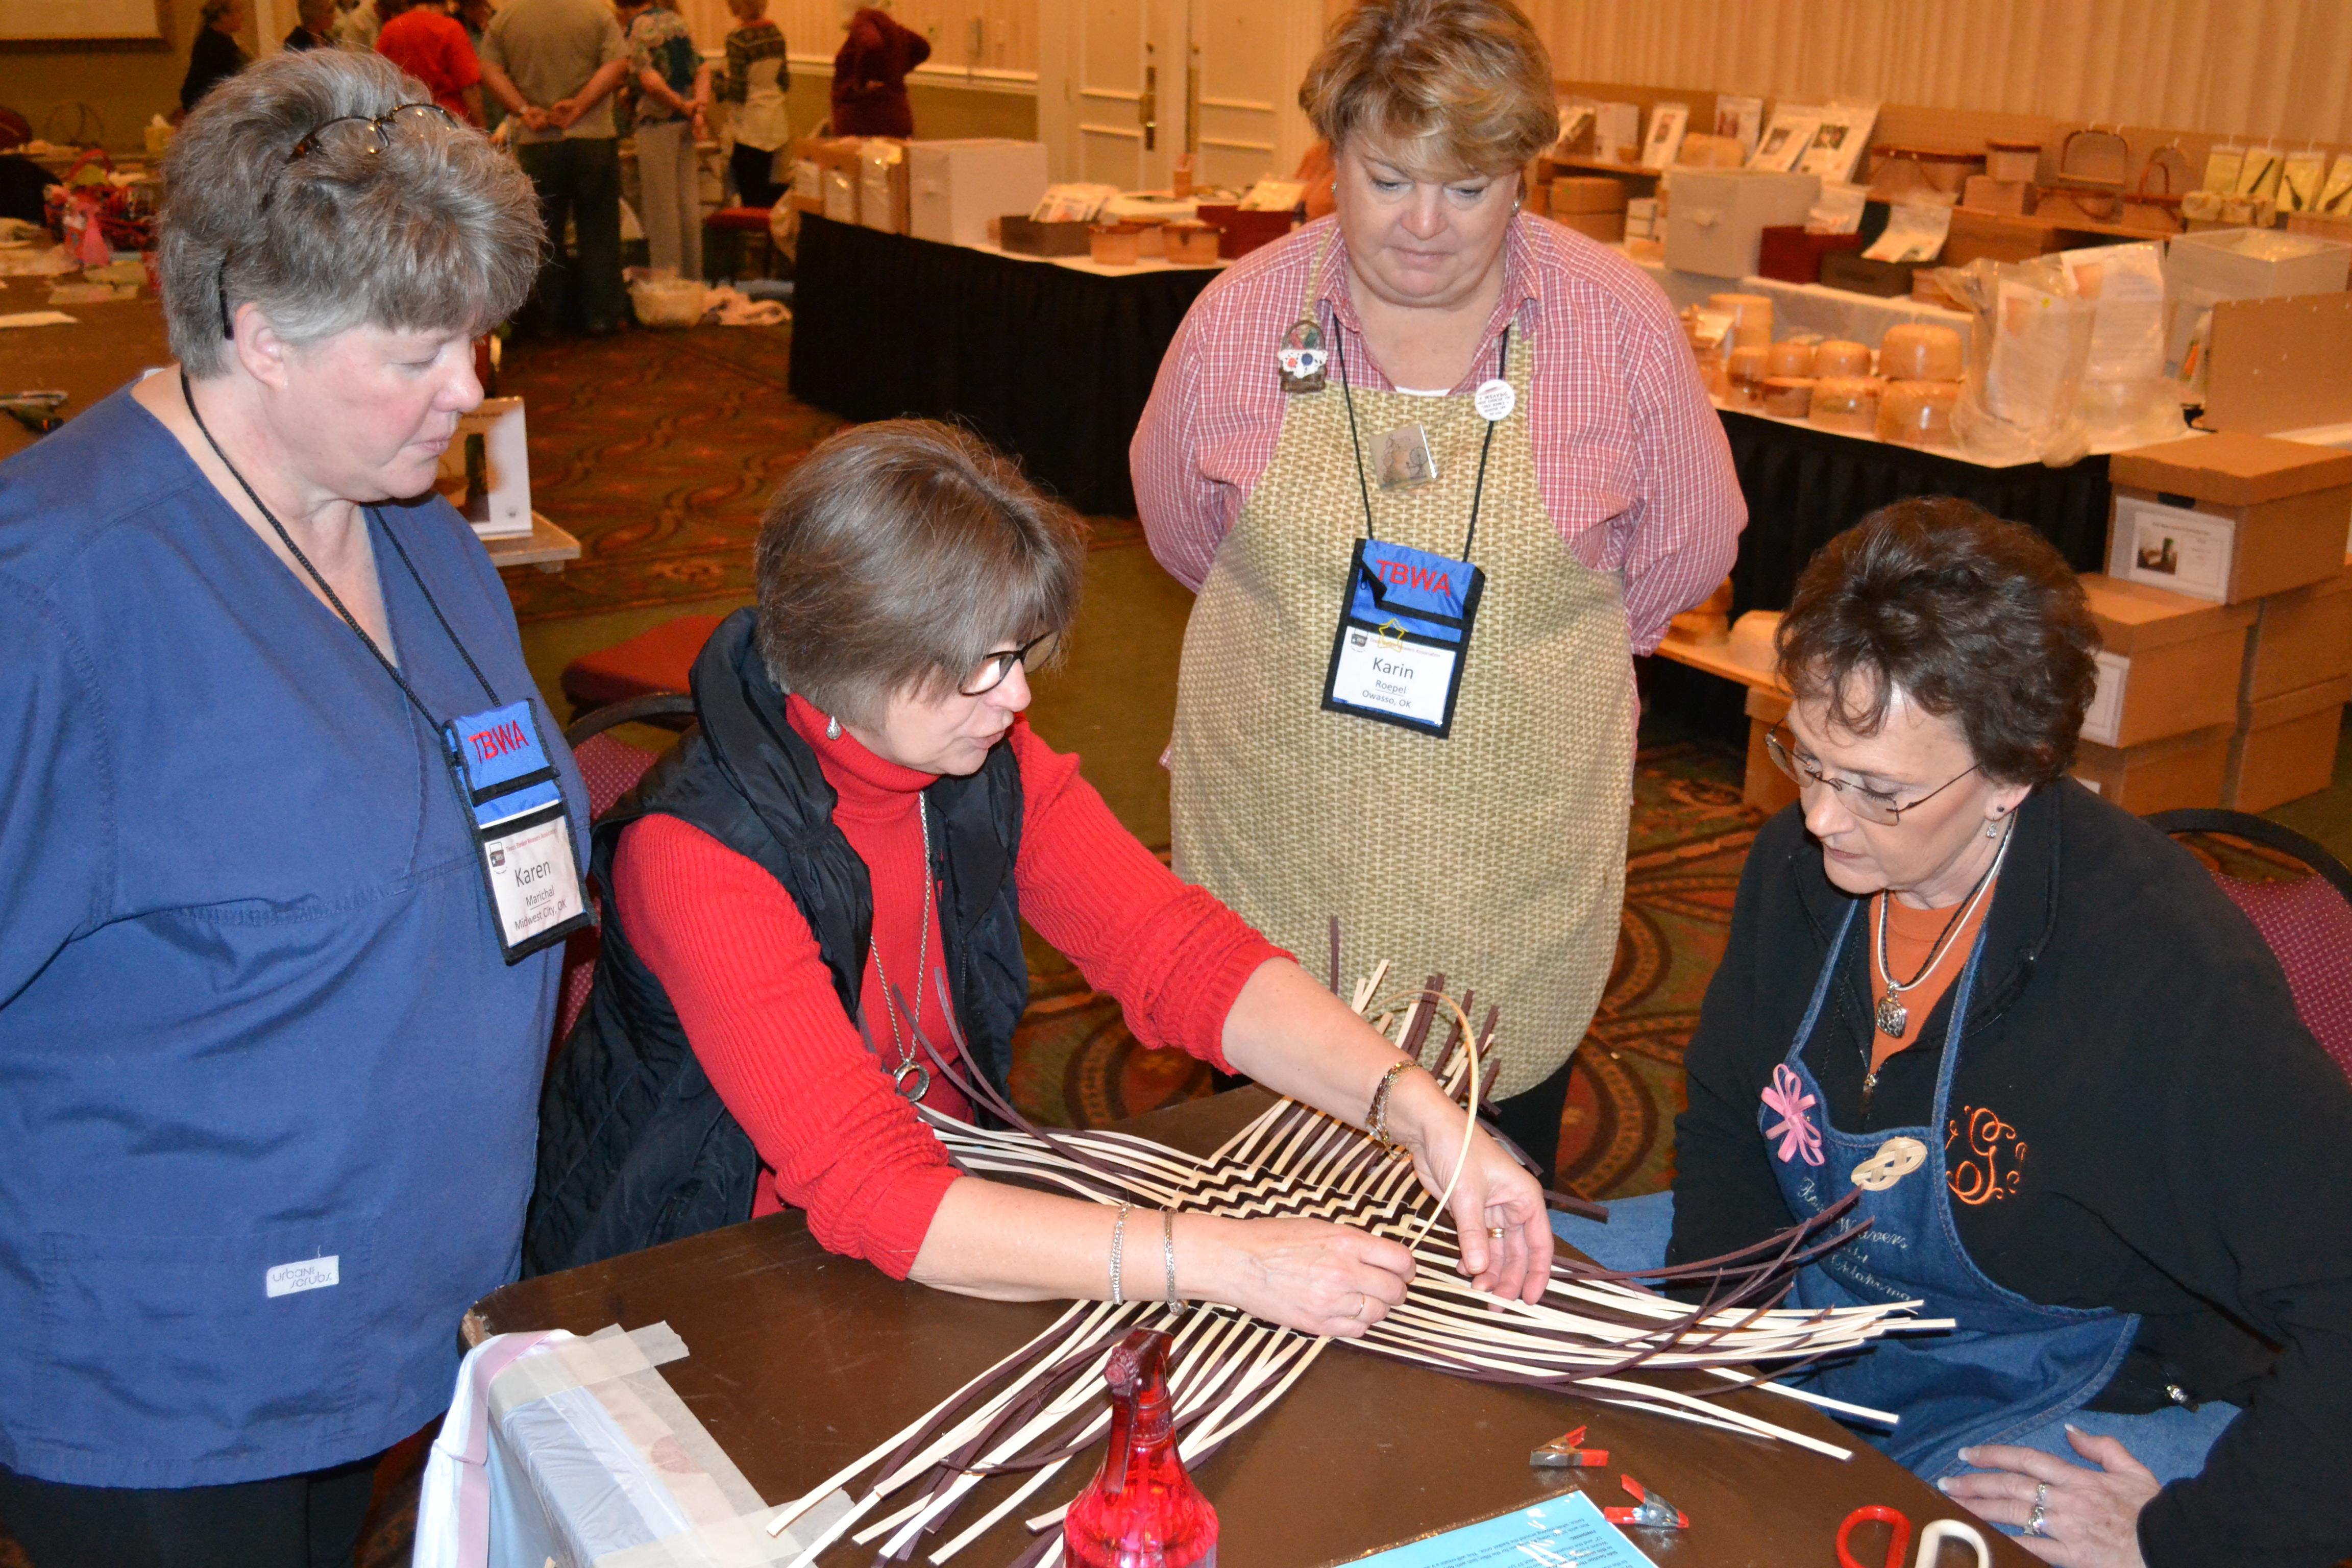 Basket weaving association : Kickin it up in dallas prairiewood basketry